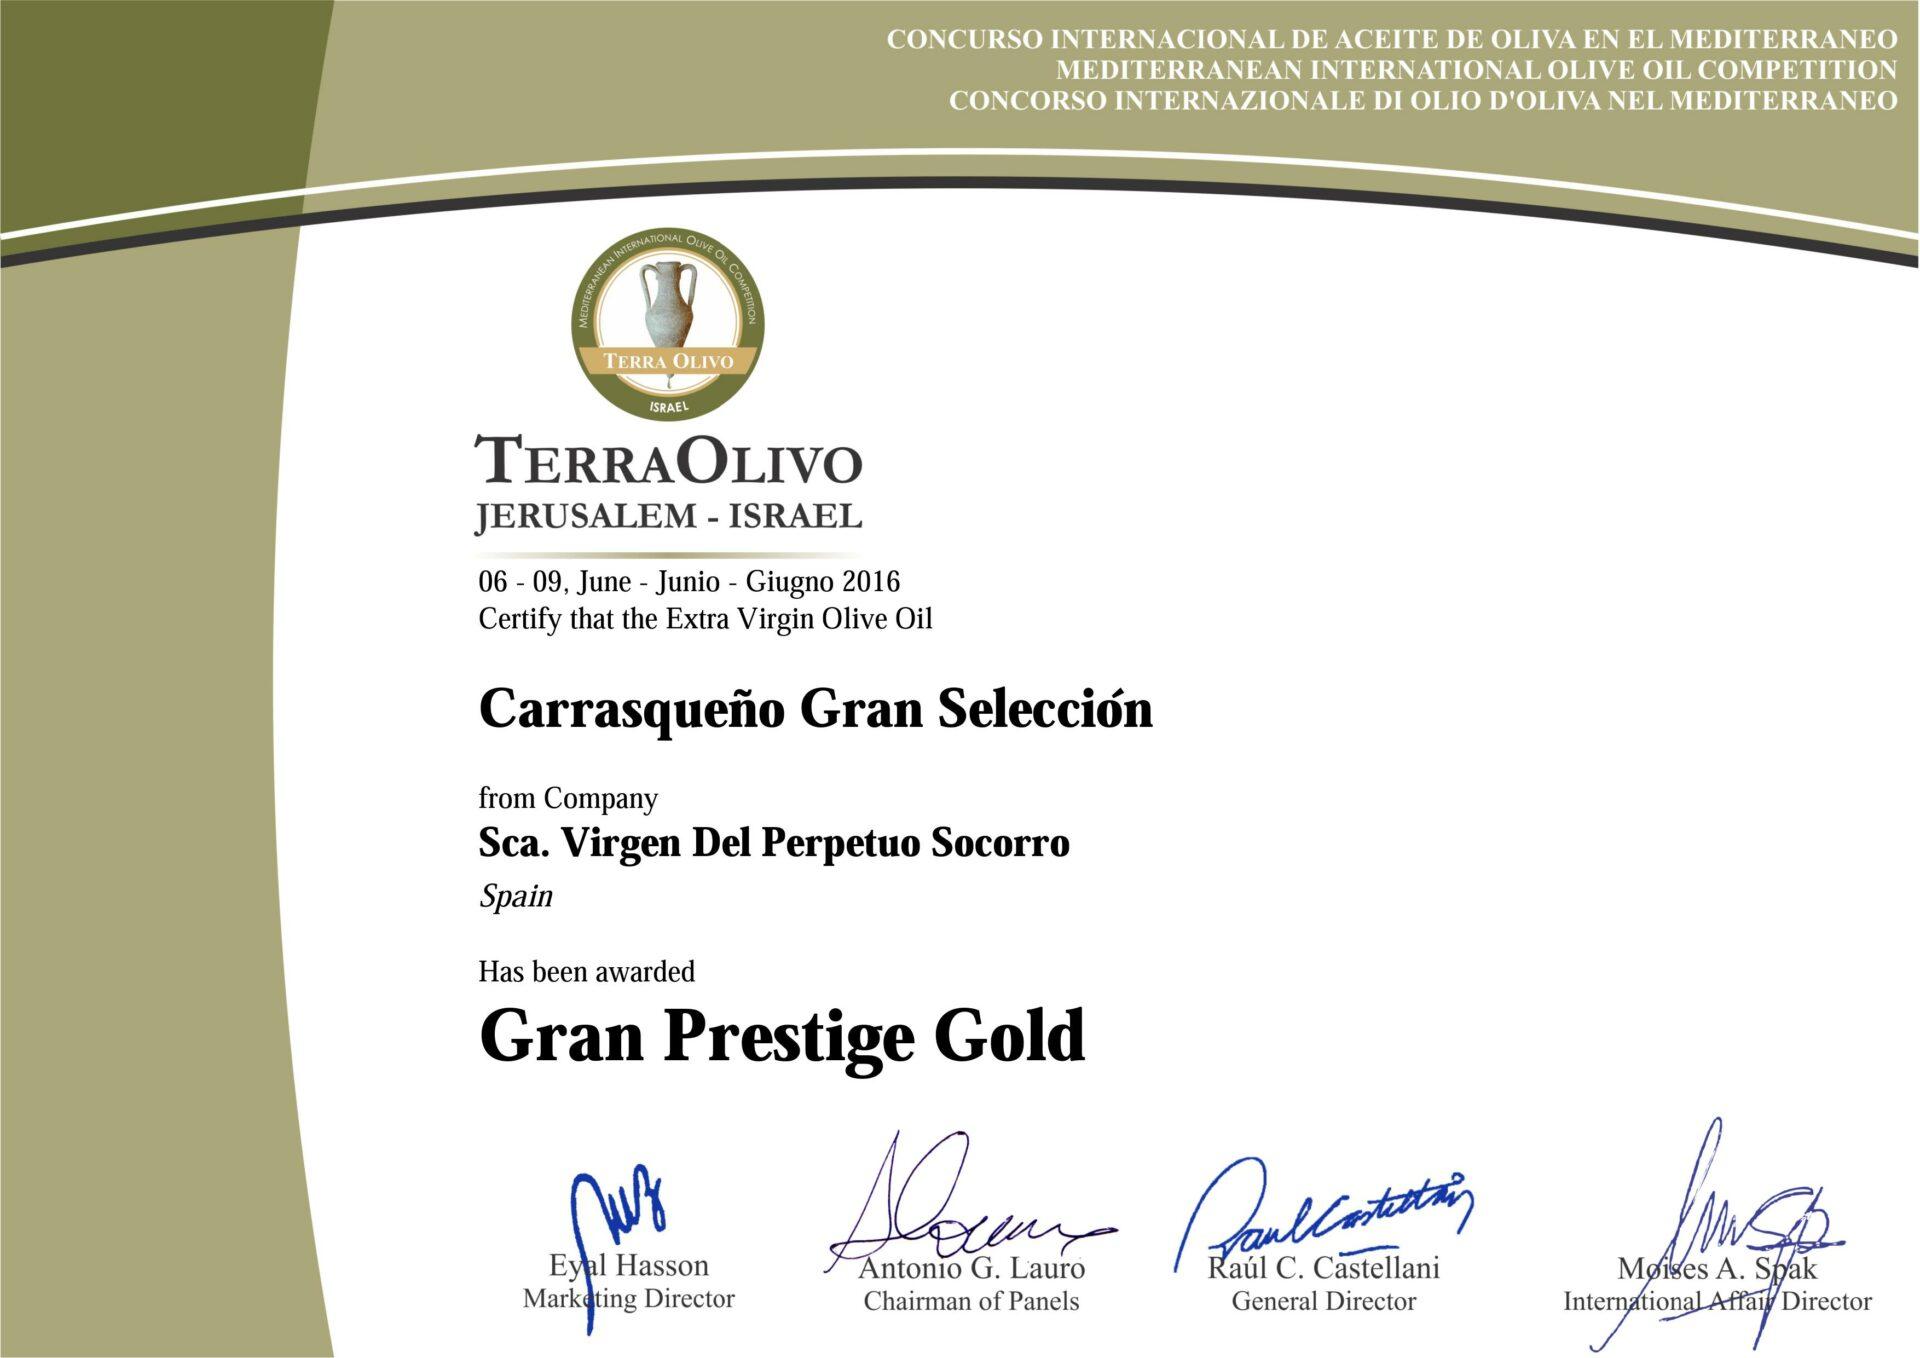 gran prestige gold